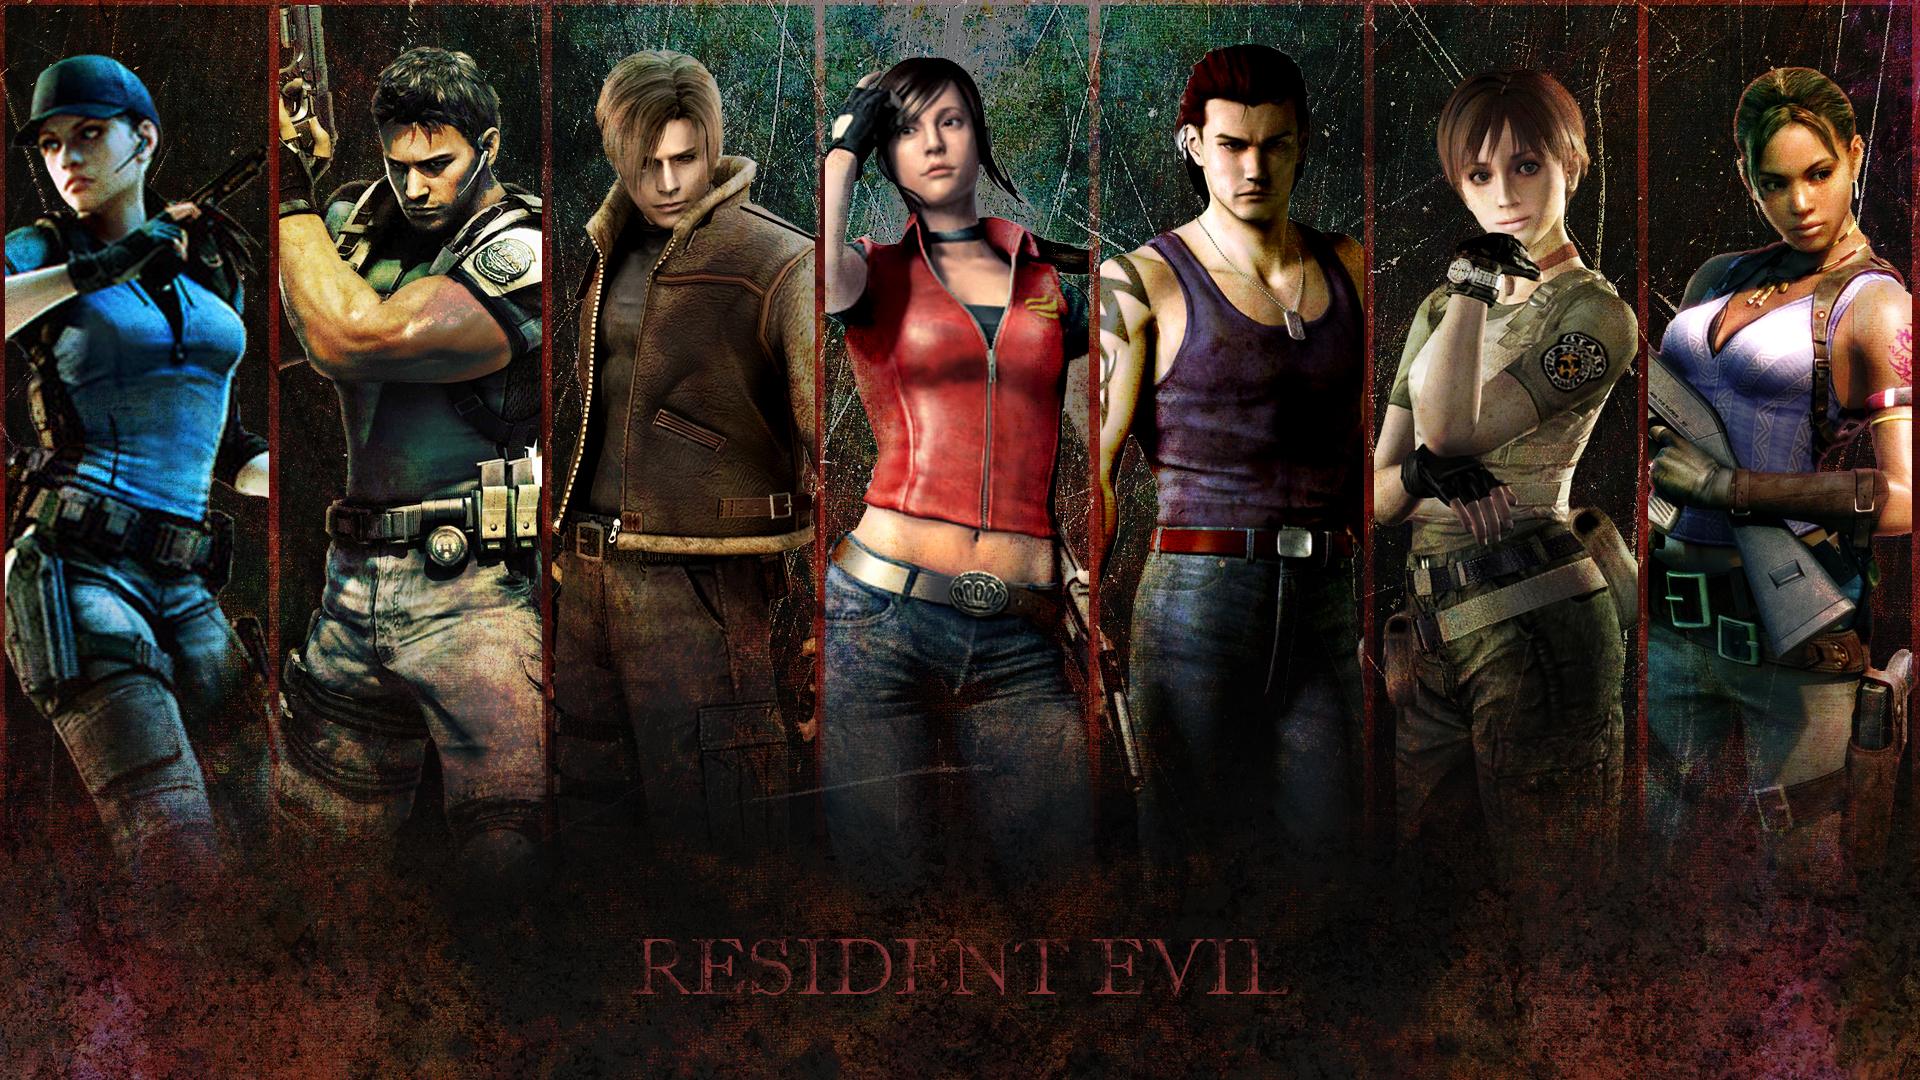 49 Resident Evil Wallpapers Free On Wallpapersafari